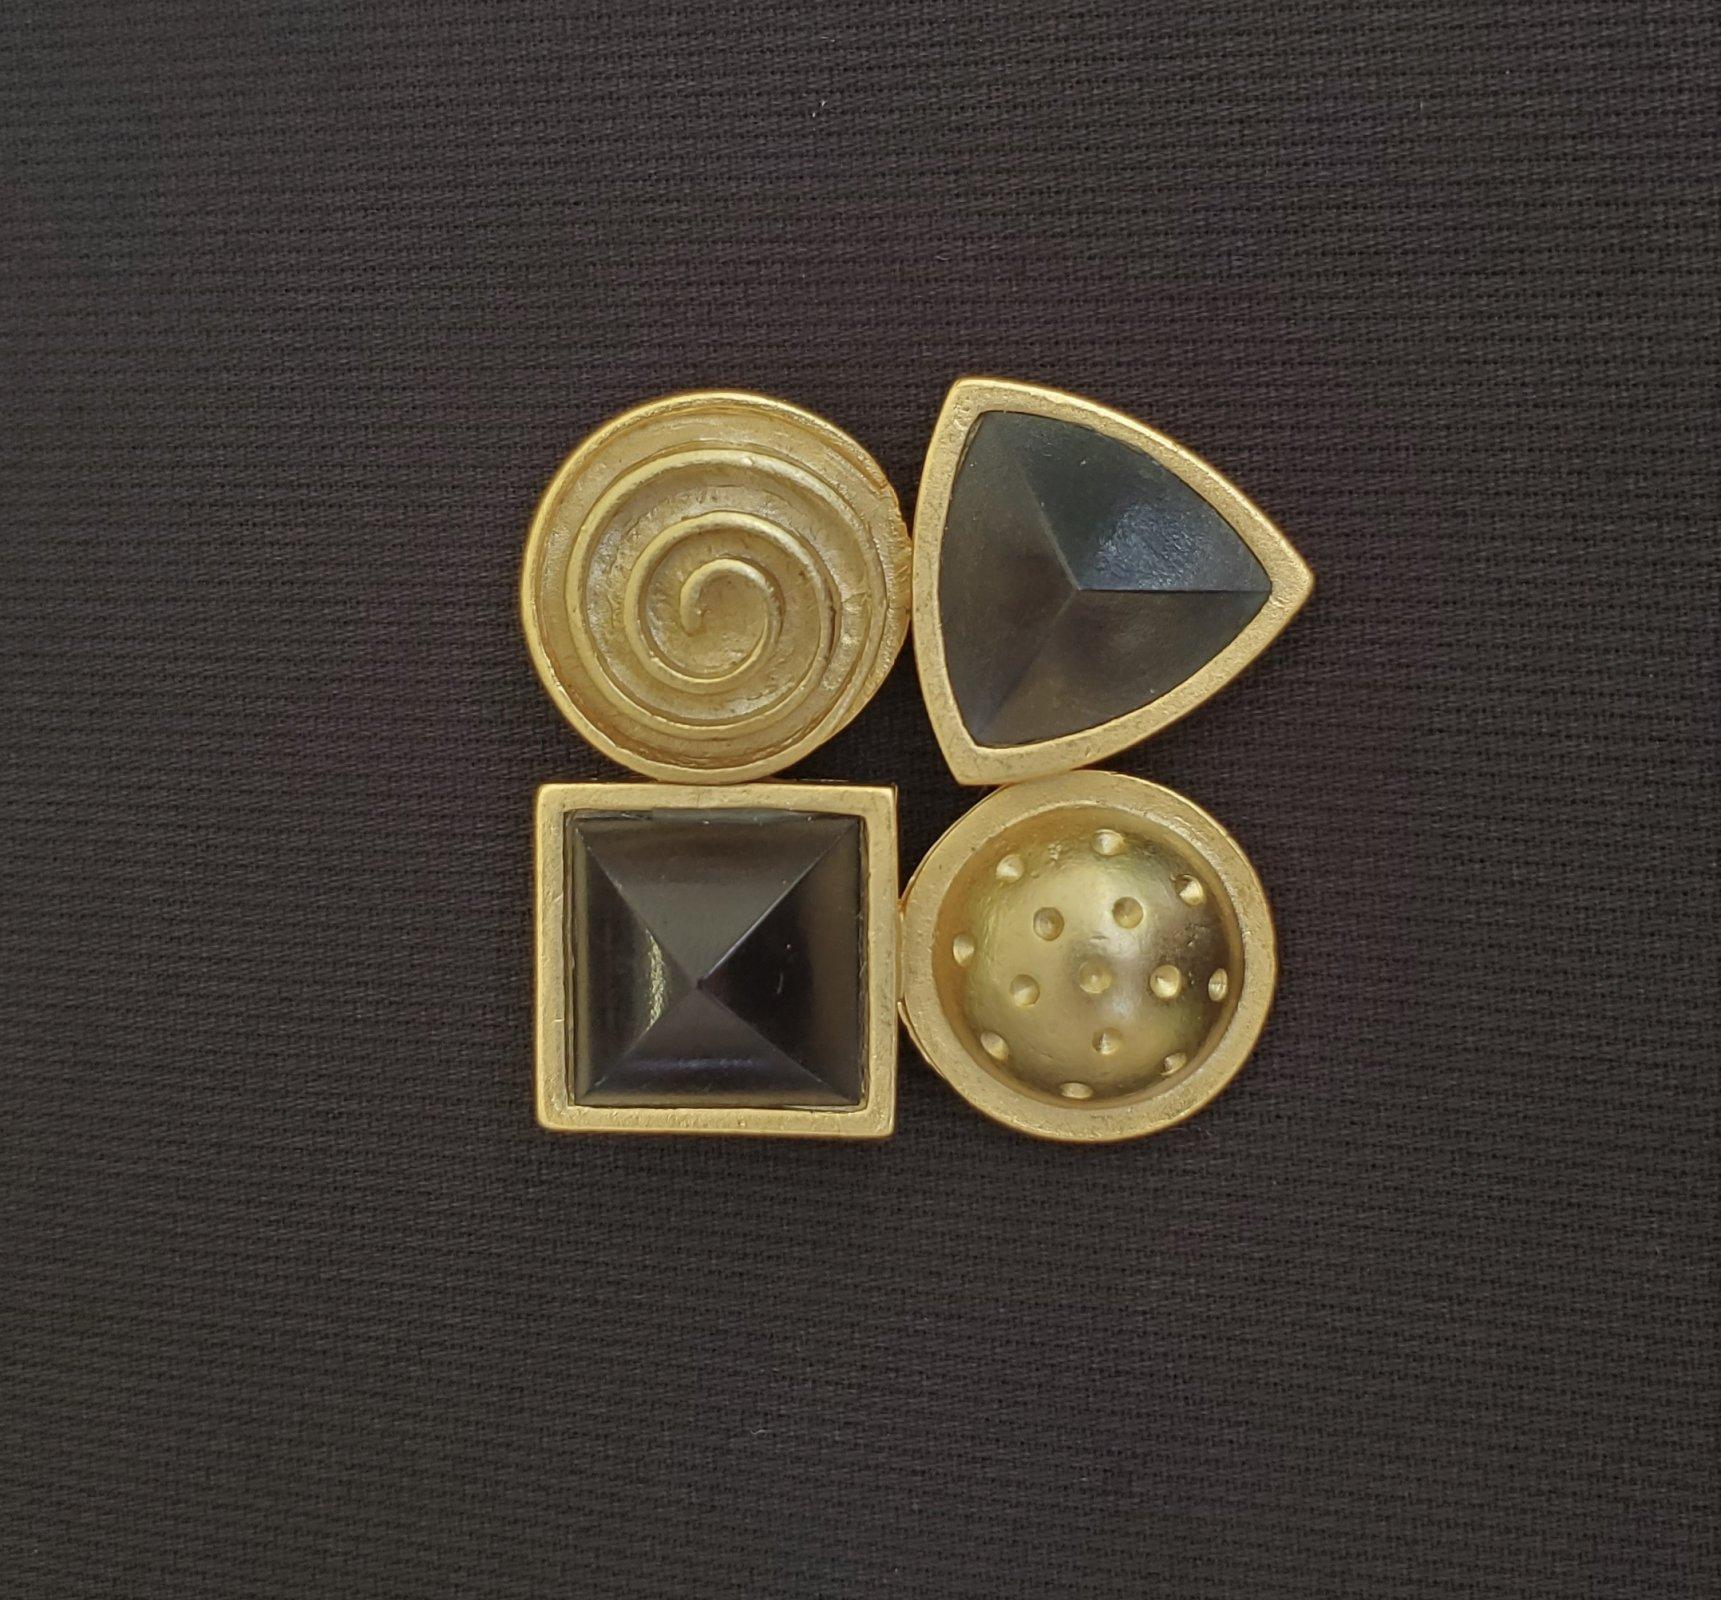 Black and gold pin-NN-010036